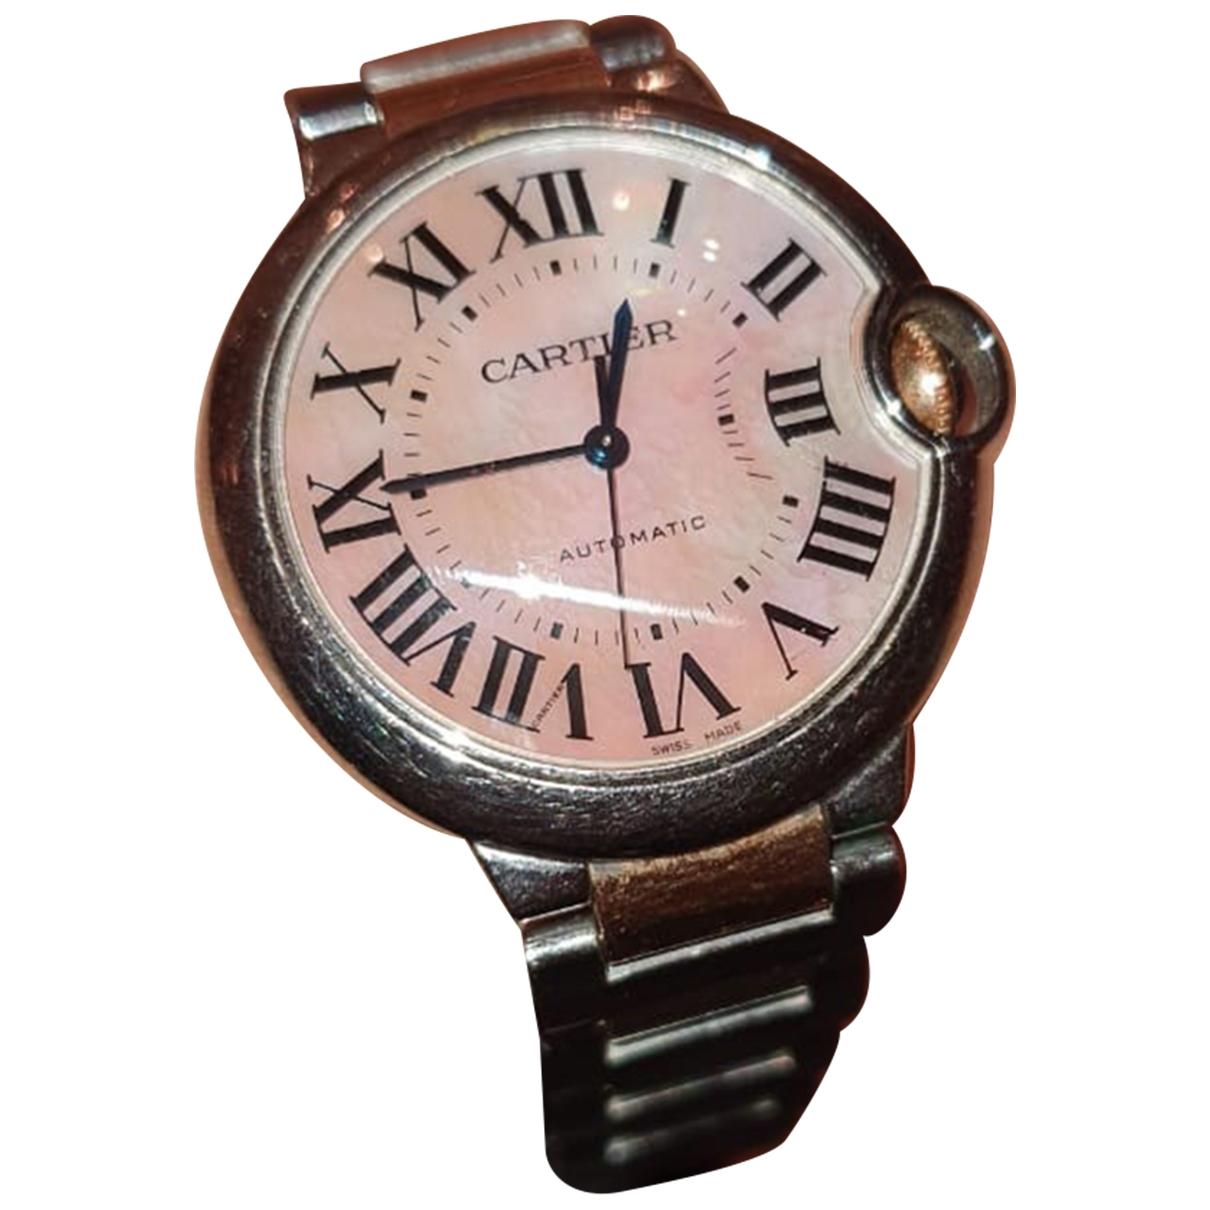 Cartier Ballon bleu Uhr in  Silber Gold und Stahl